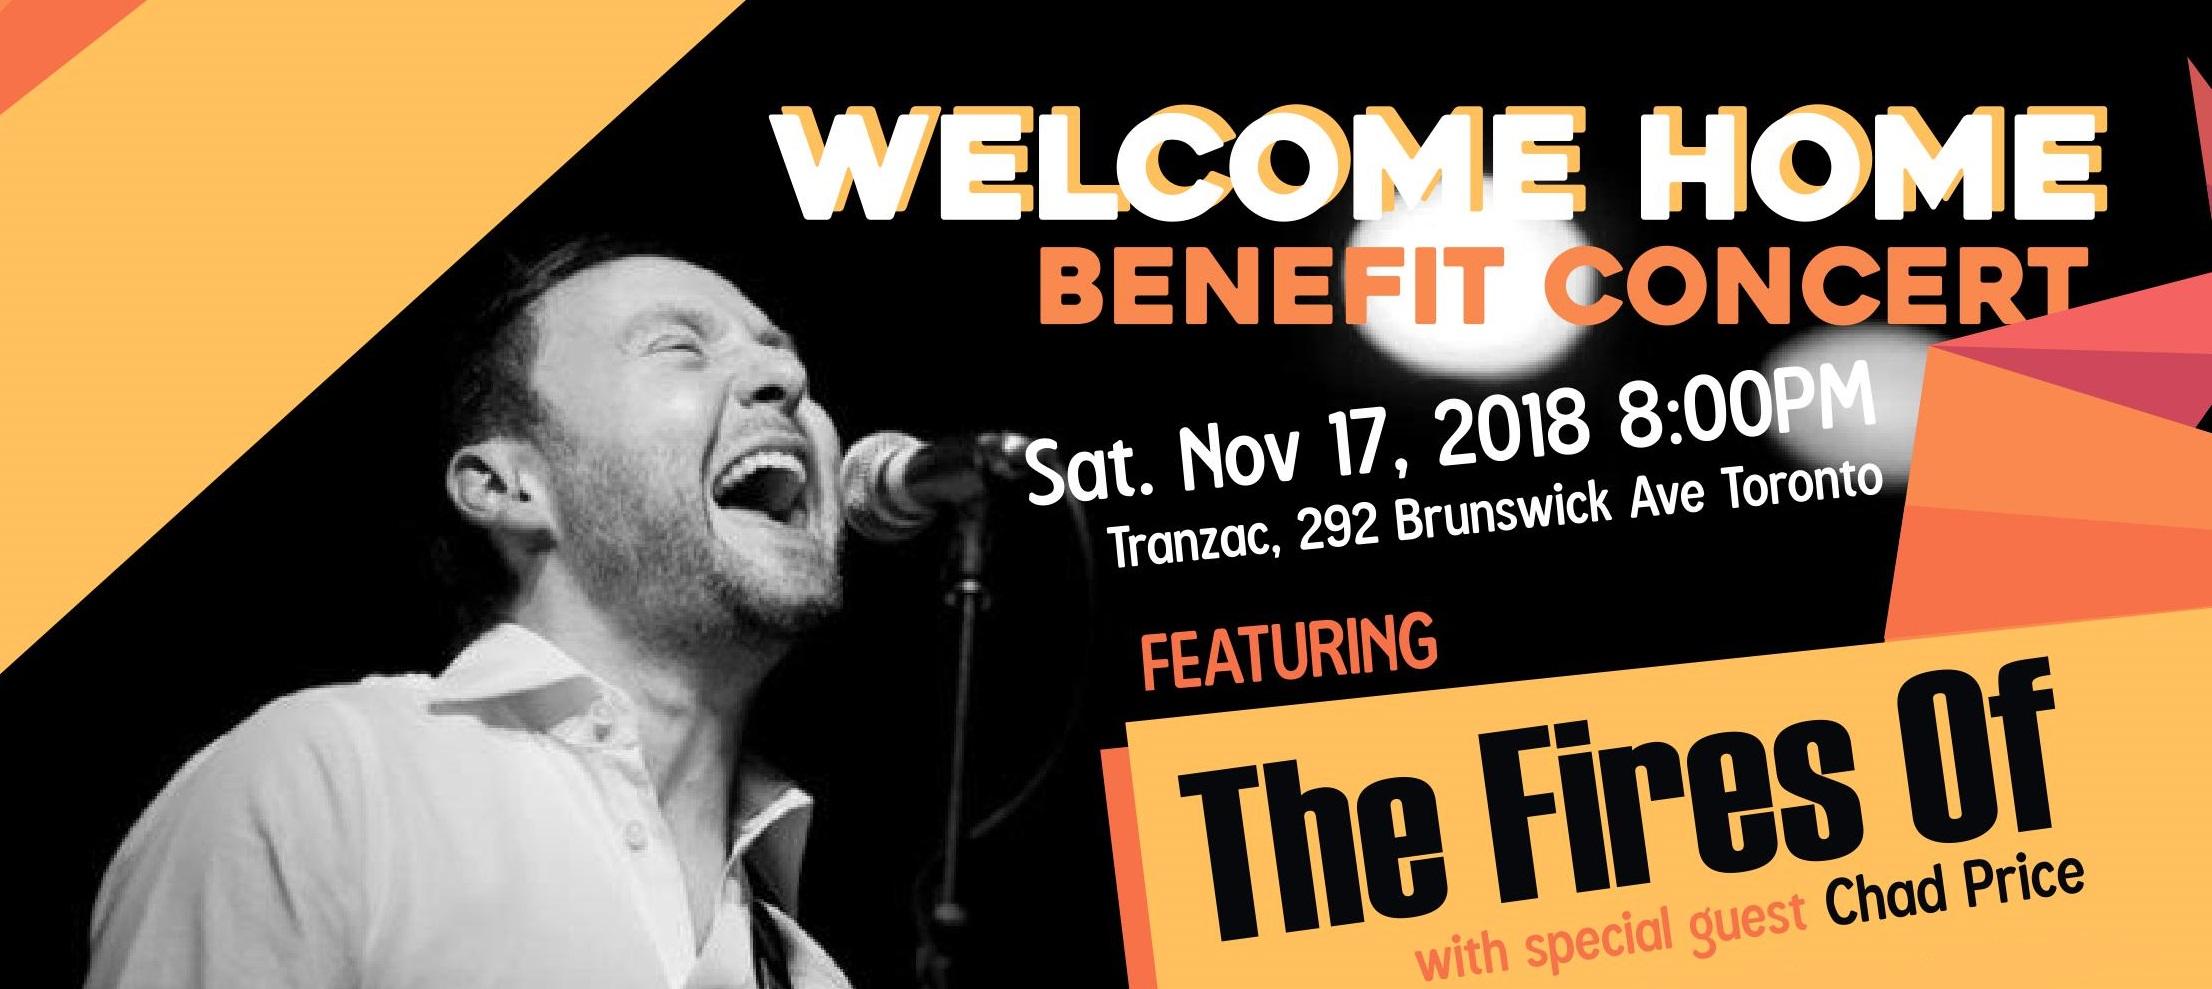 September 2018: Welcome Home Benefit Concert,Let's PLAY Fall Session, LINC Stories, LIGHTS Program, Bridging Programs News,HOPES Program,Womens Group